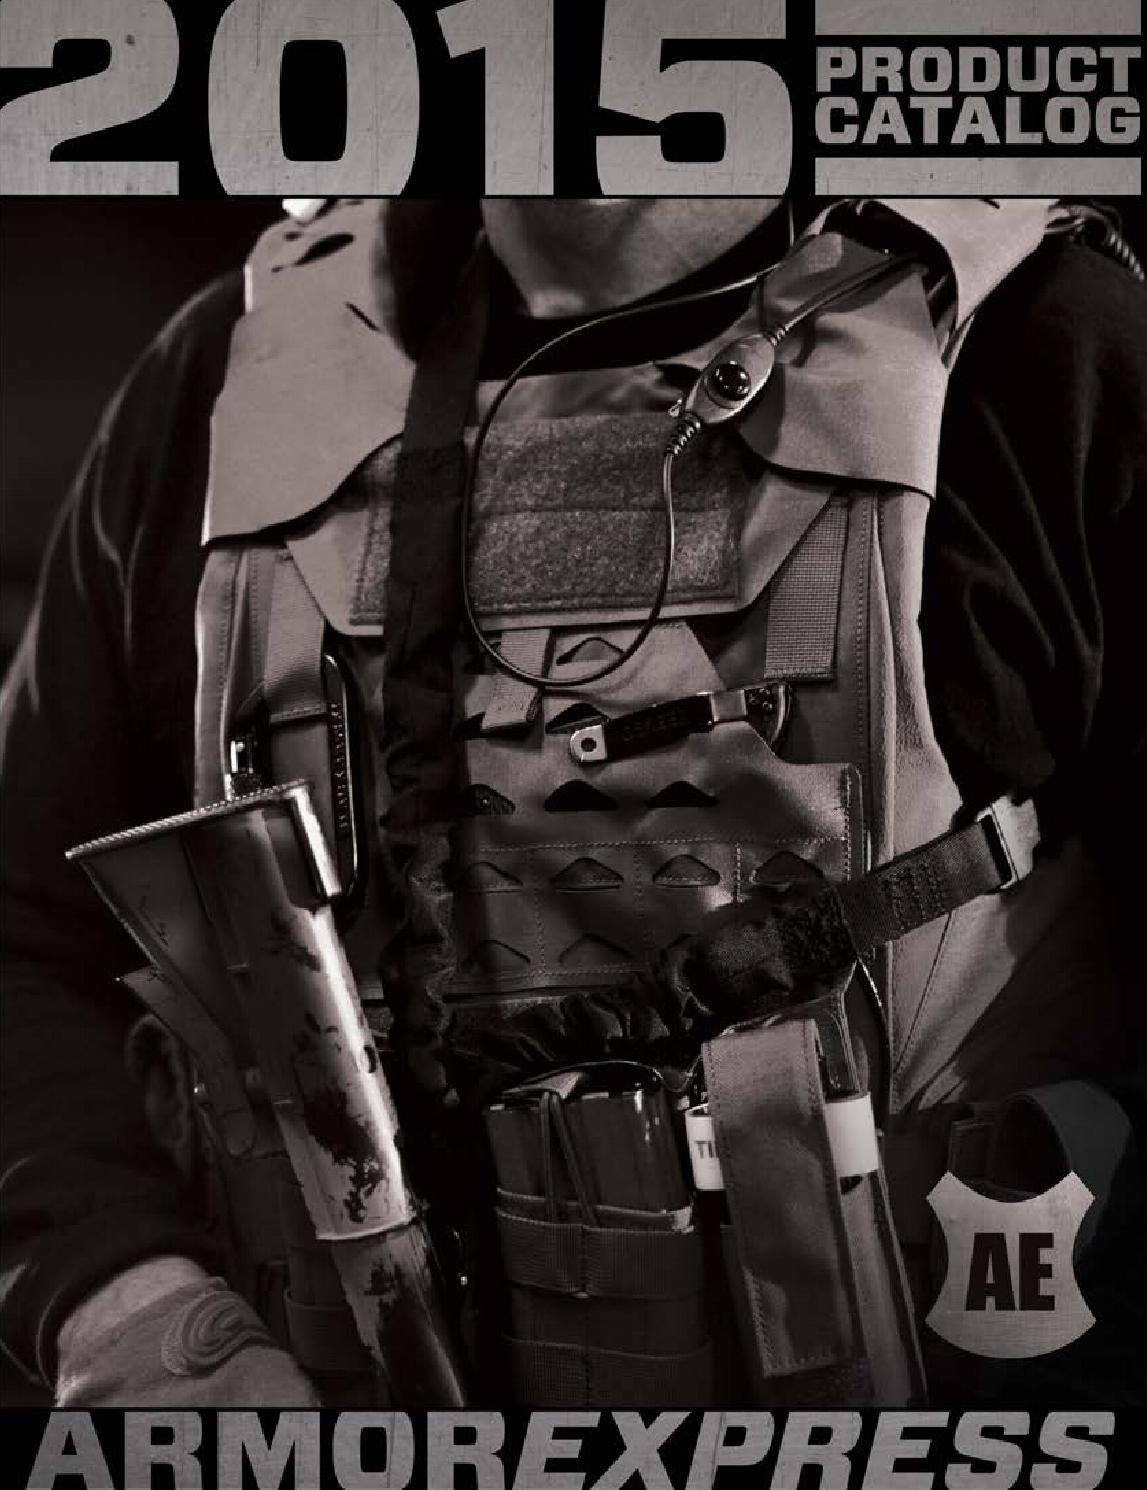 "Dyneema Dupont Kevlar Replacement ballistic bullet fabric 5/""x12/"" 12 Sheet Pack"